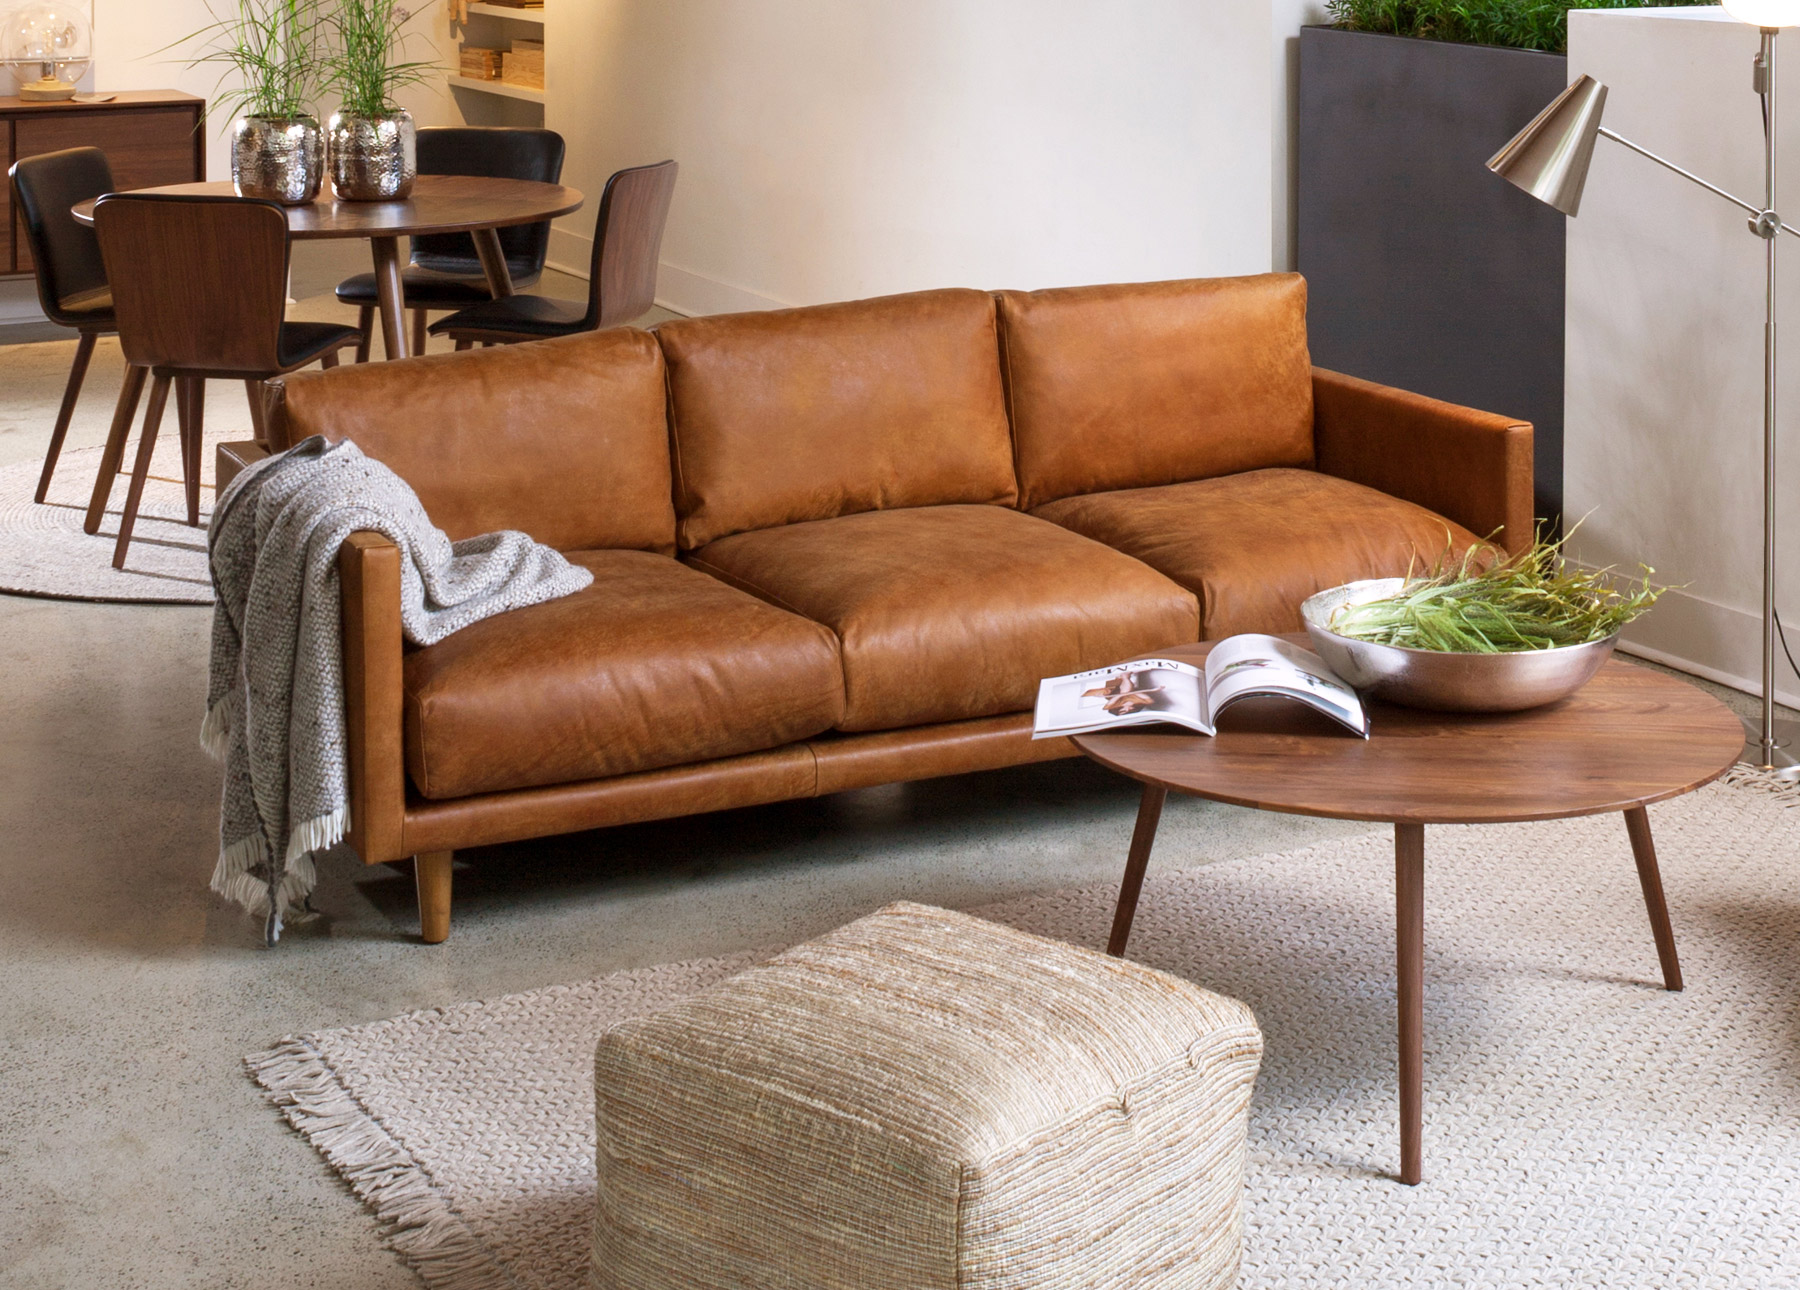 Nirvana Dakota Tan Sofa With An Amoeba Wild Walnut Coffee Table